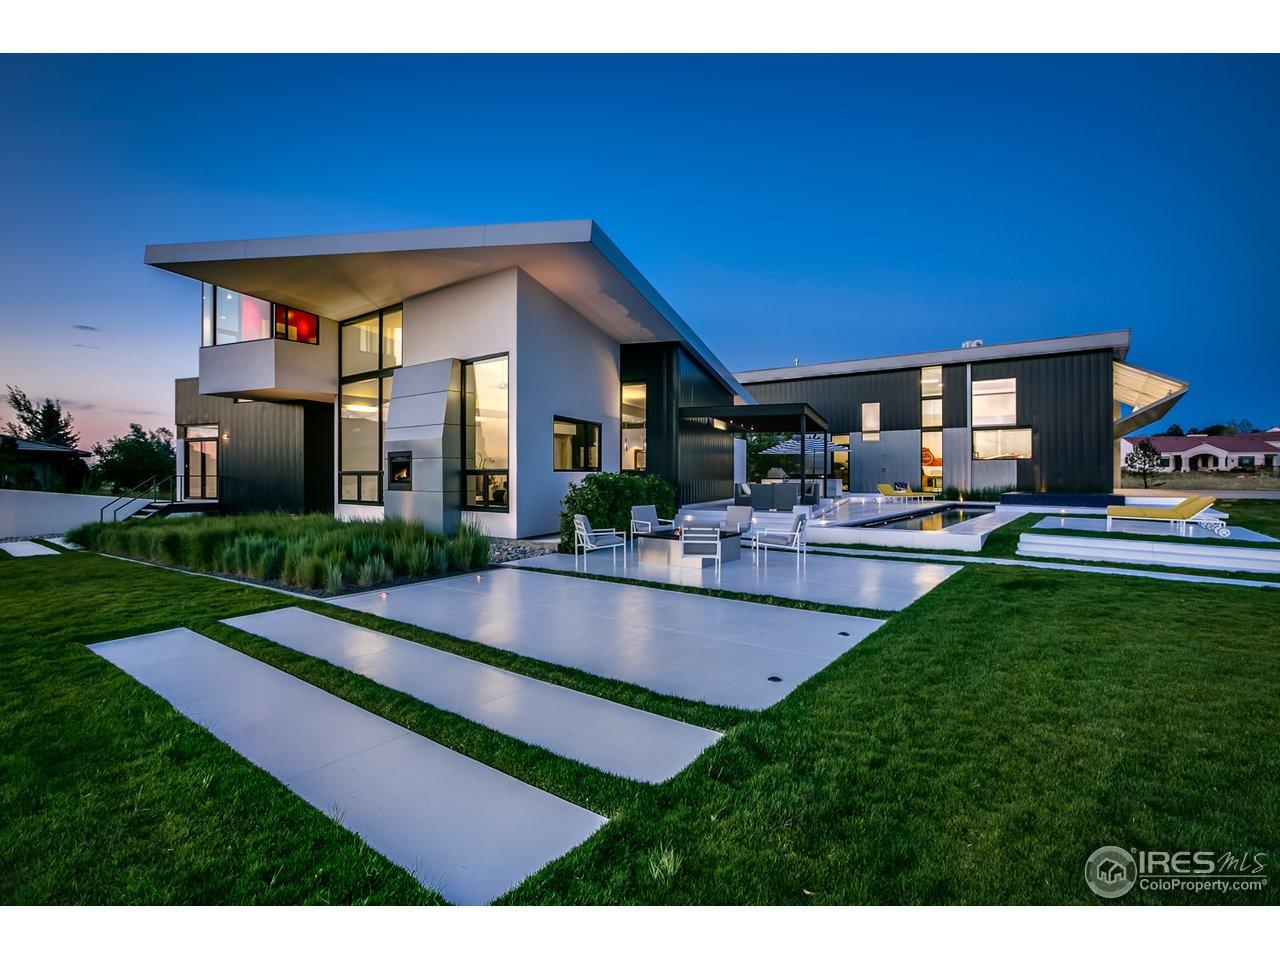 Homes For Sale In Erie Colorado Bernardi Real Estate Group